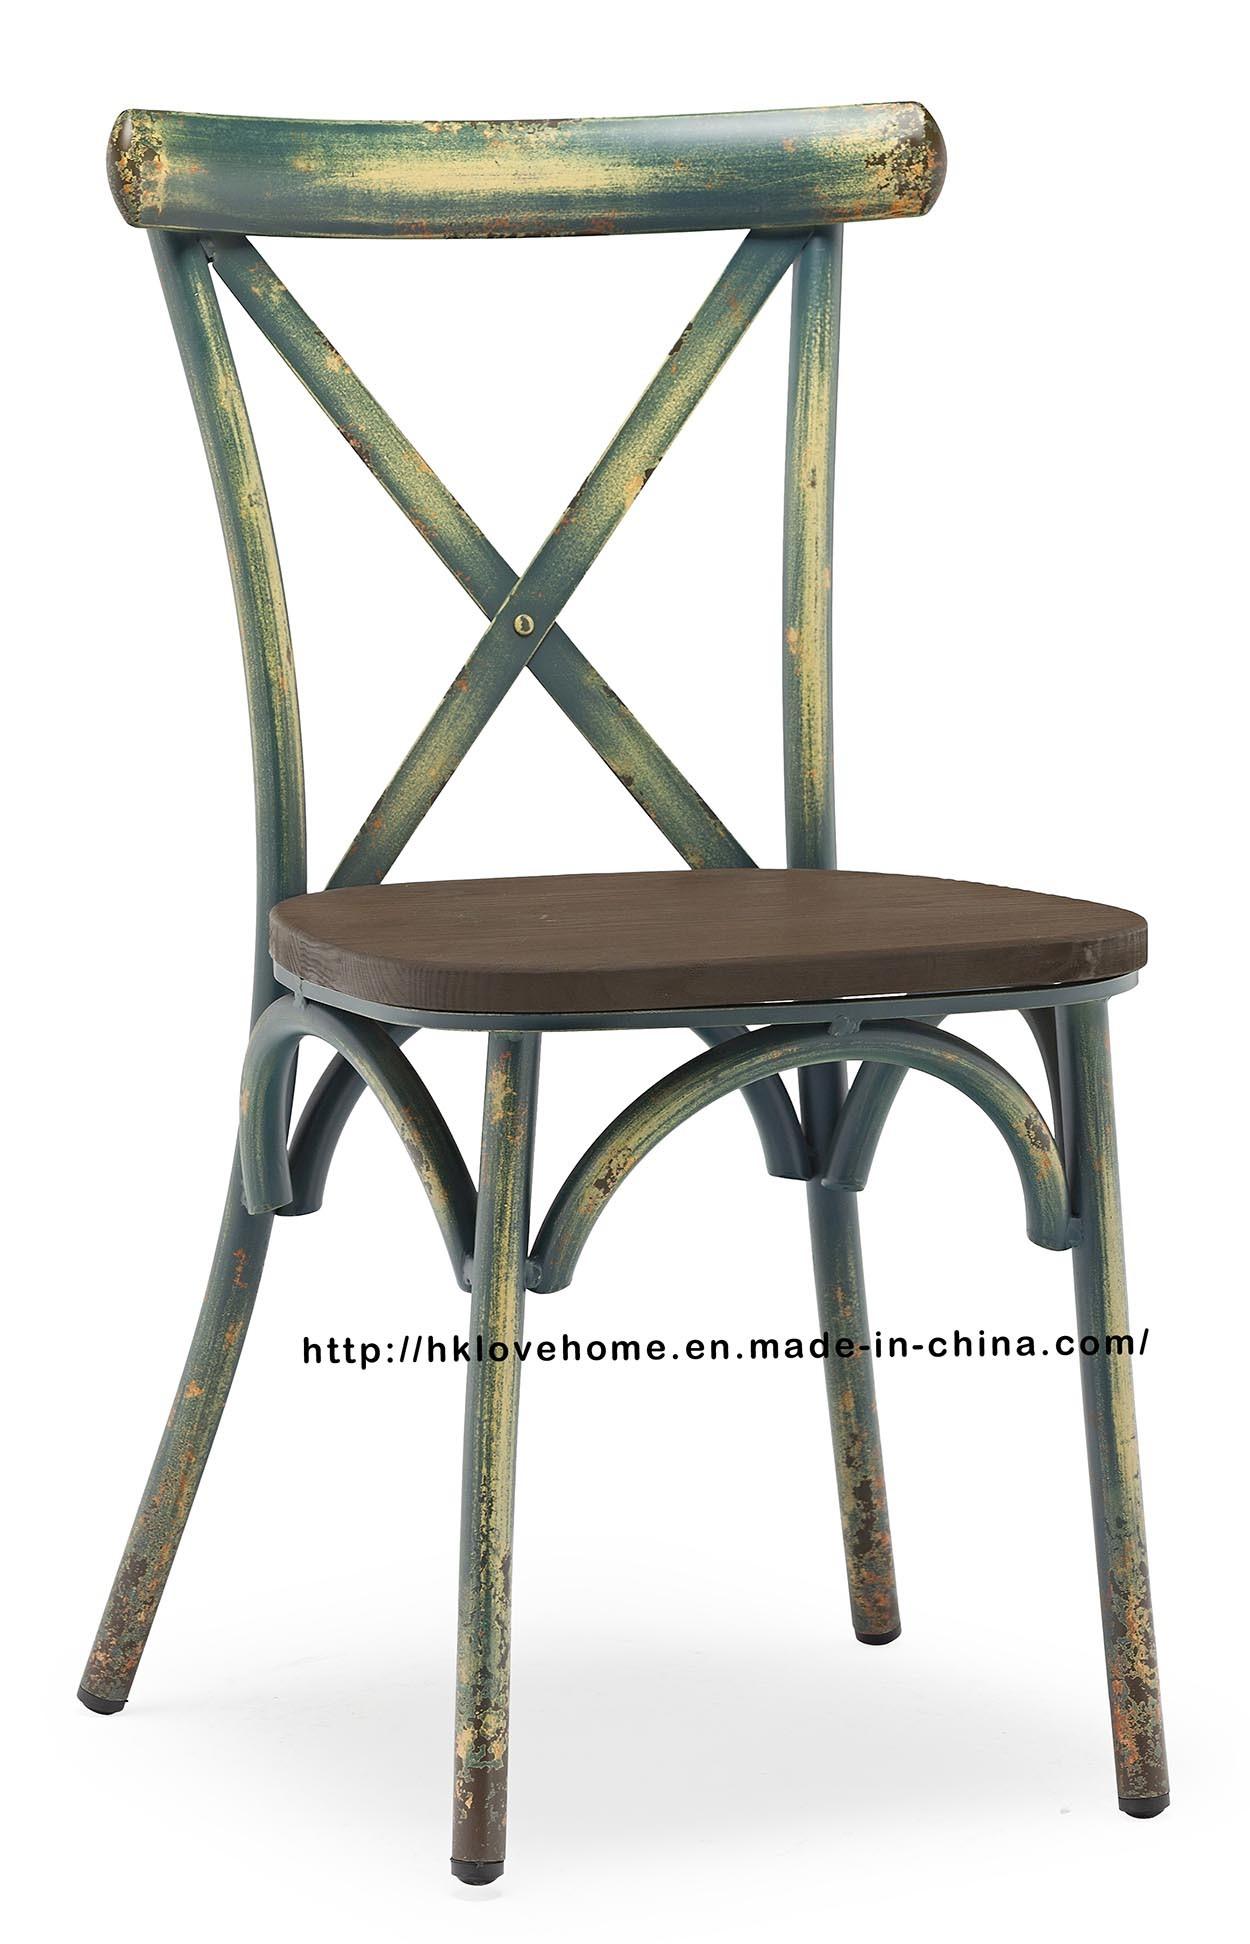 Hot Item Morden Dining Restaurant Coffee Stackable Metal Wooden Cross Back Chairs